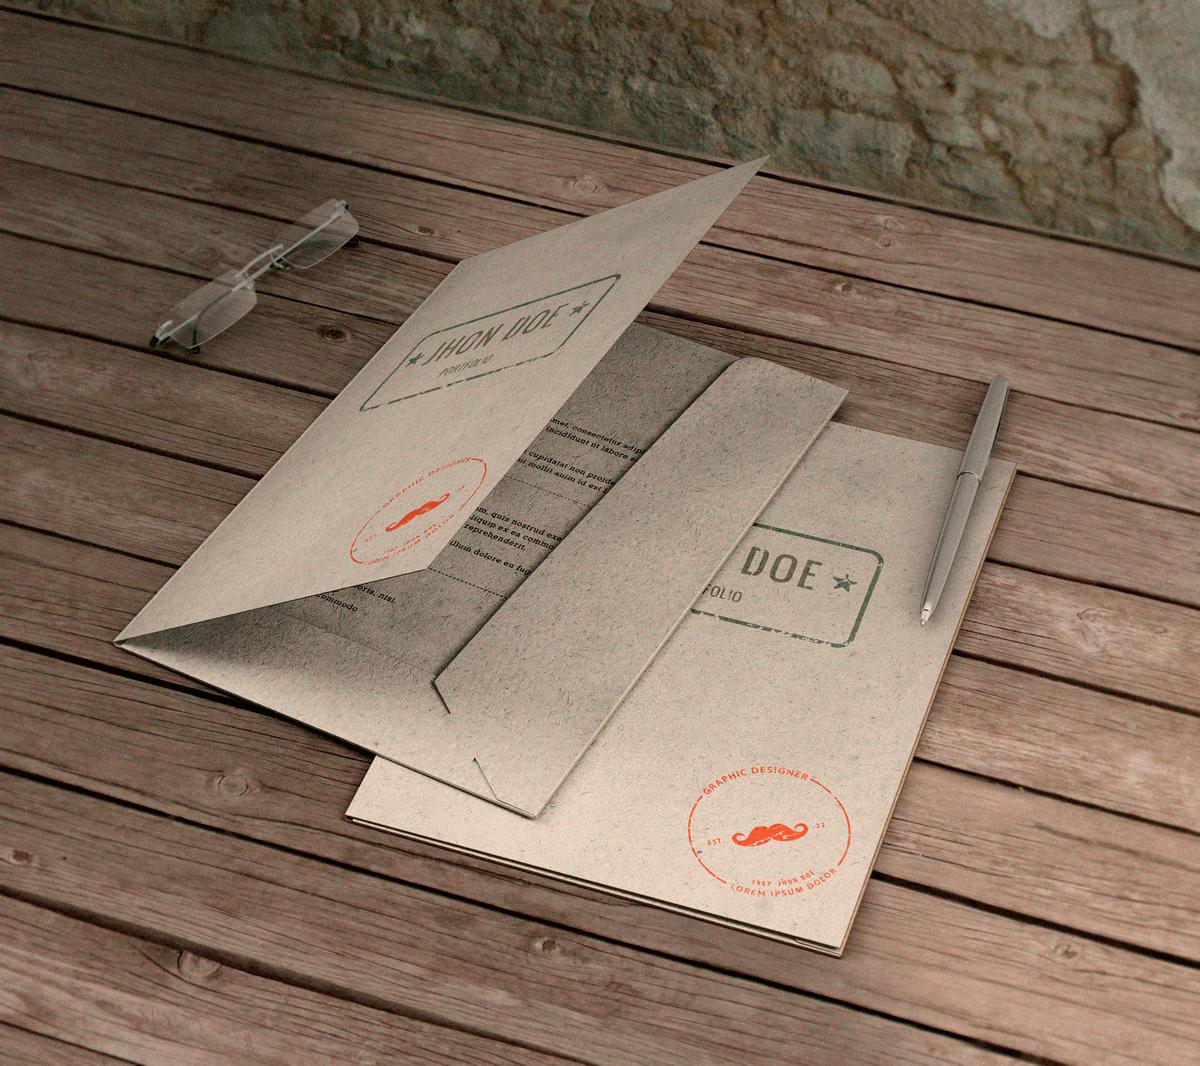 folder-vintage-train